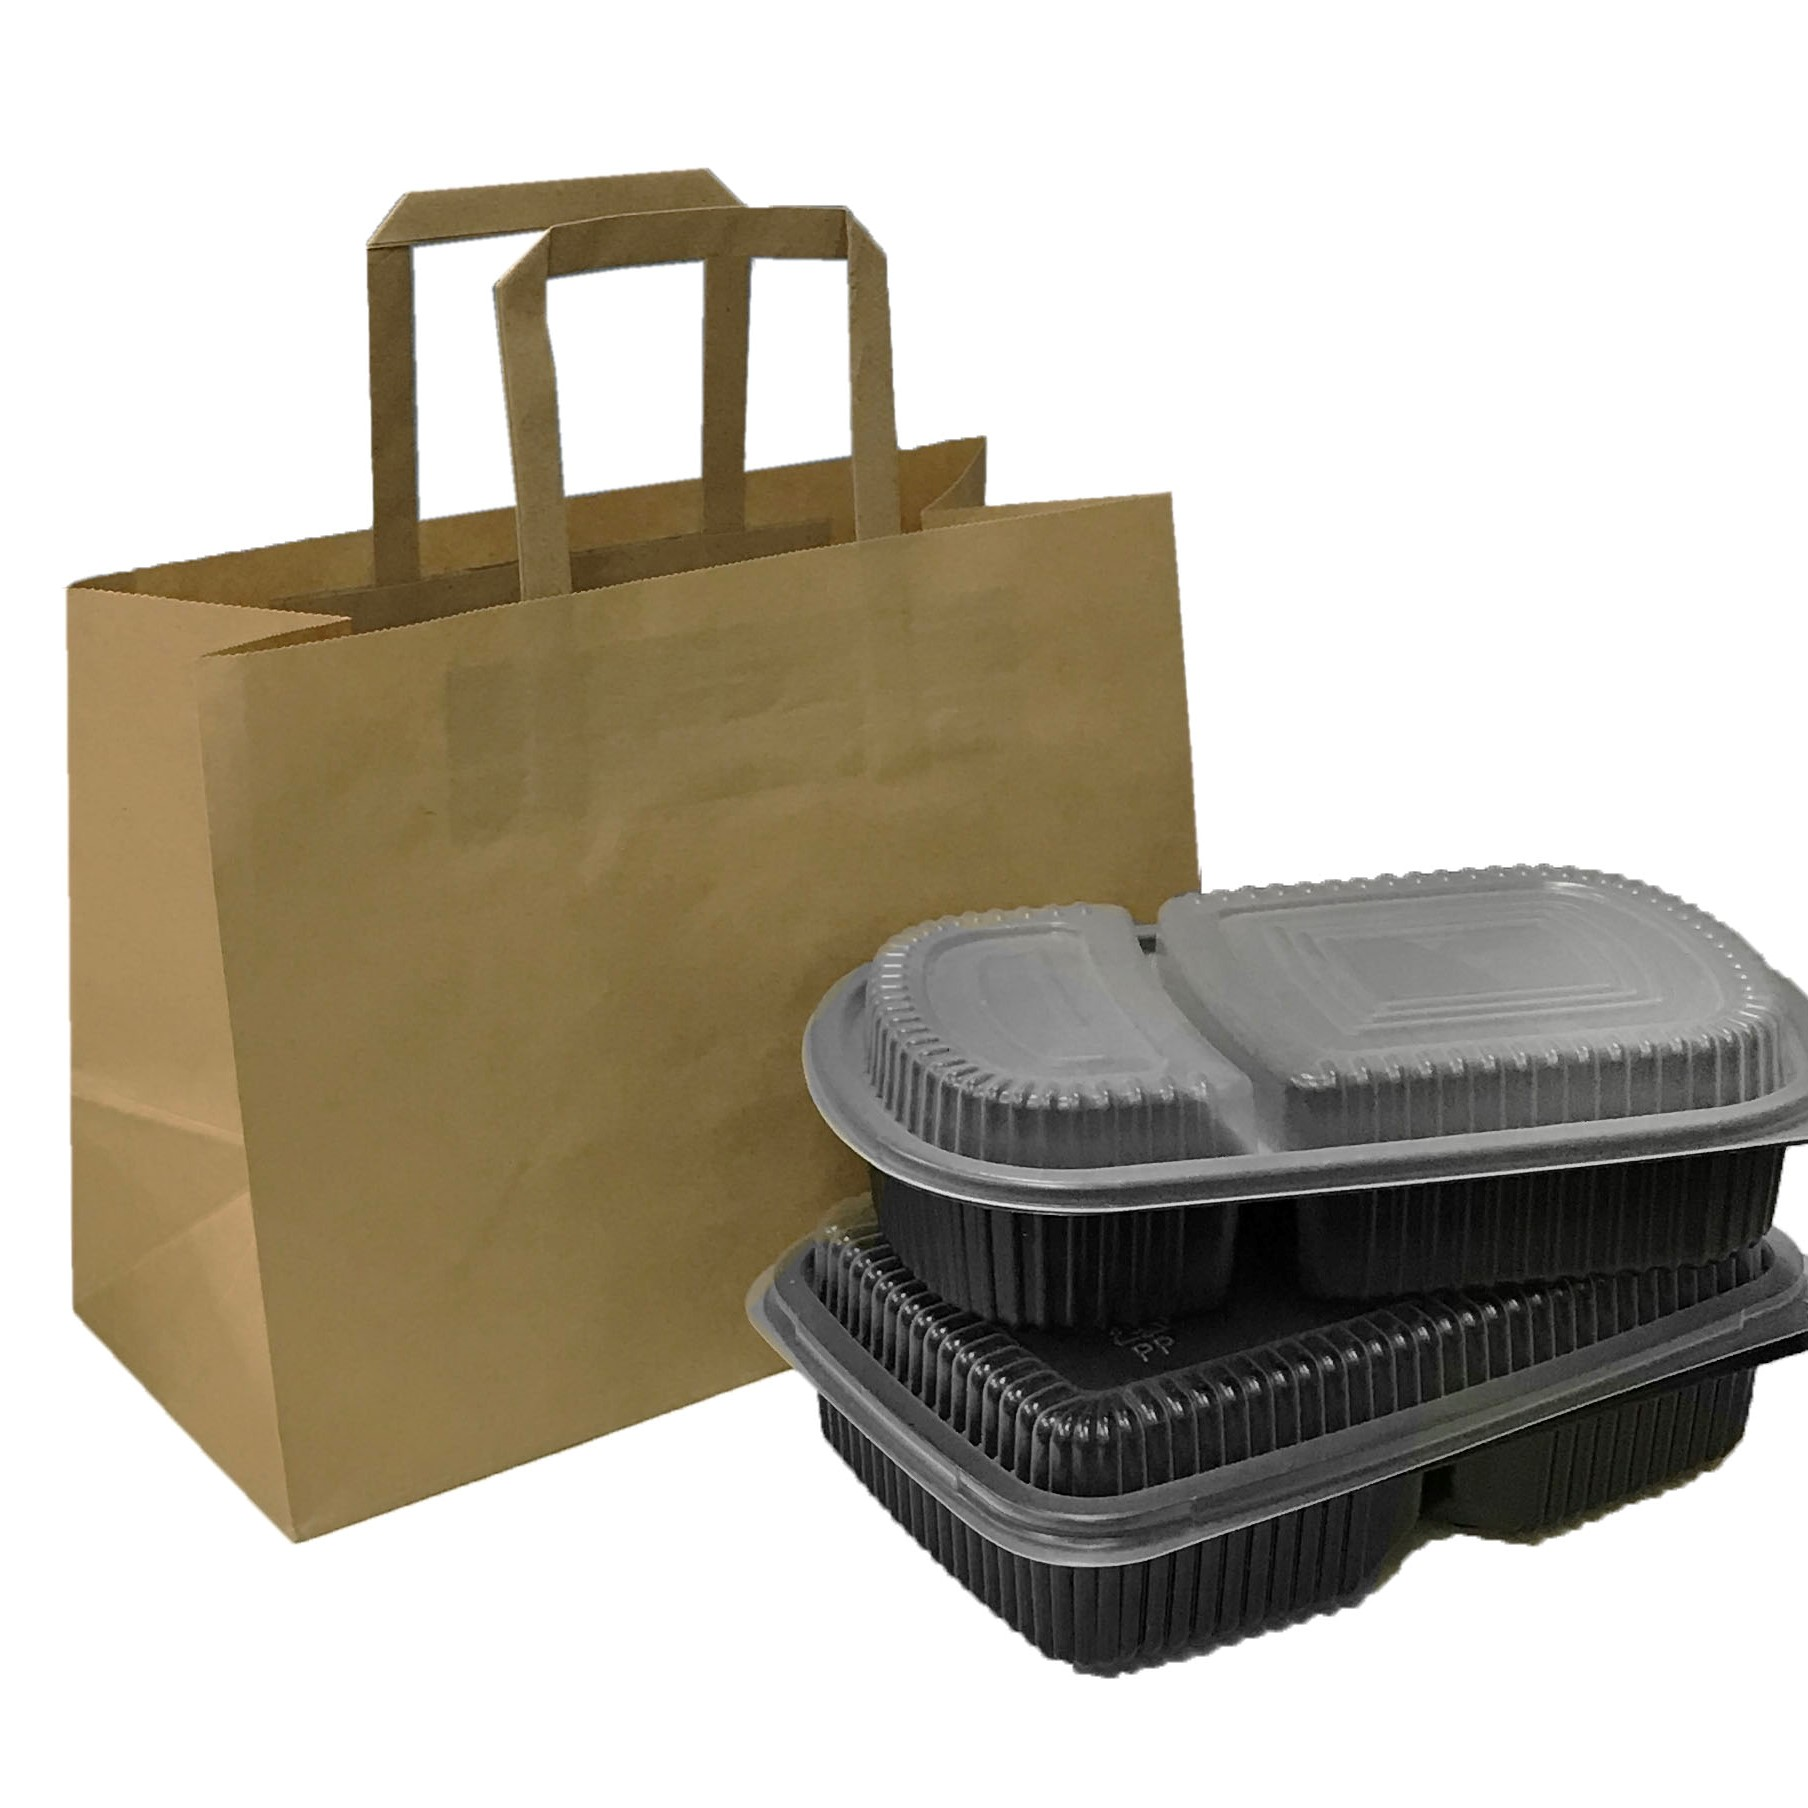 SALE: FLAT HANDLE PAPER BAGS